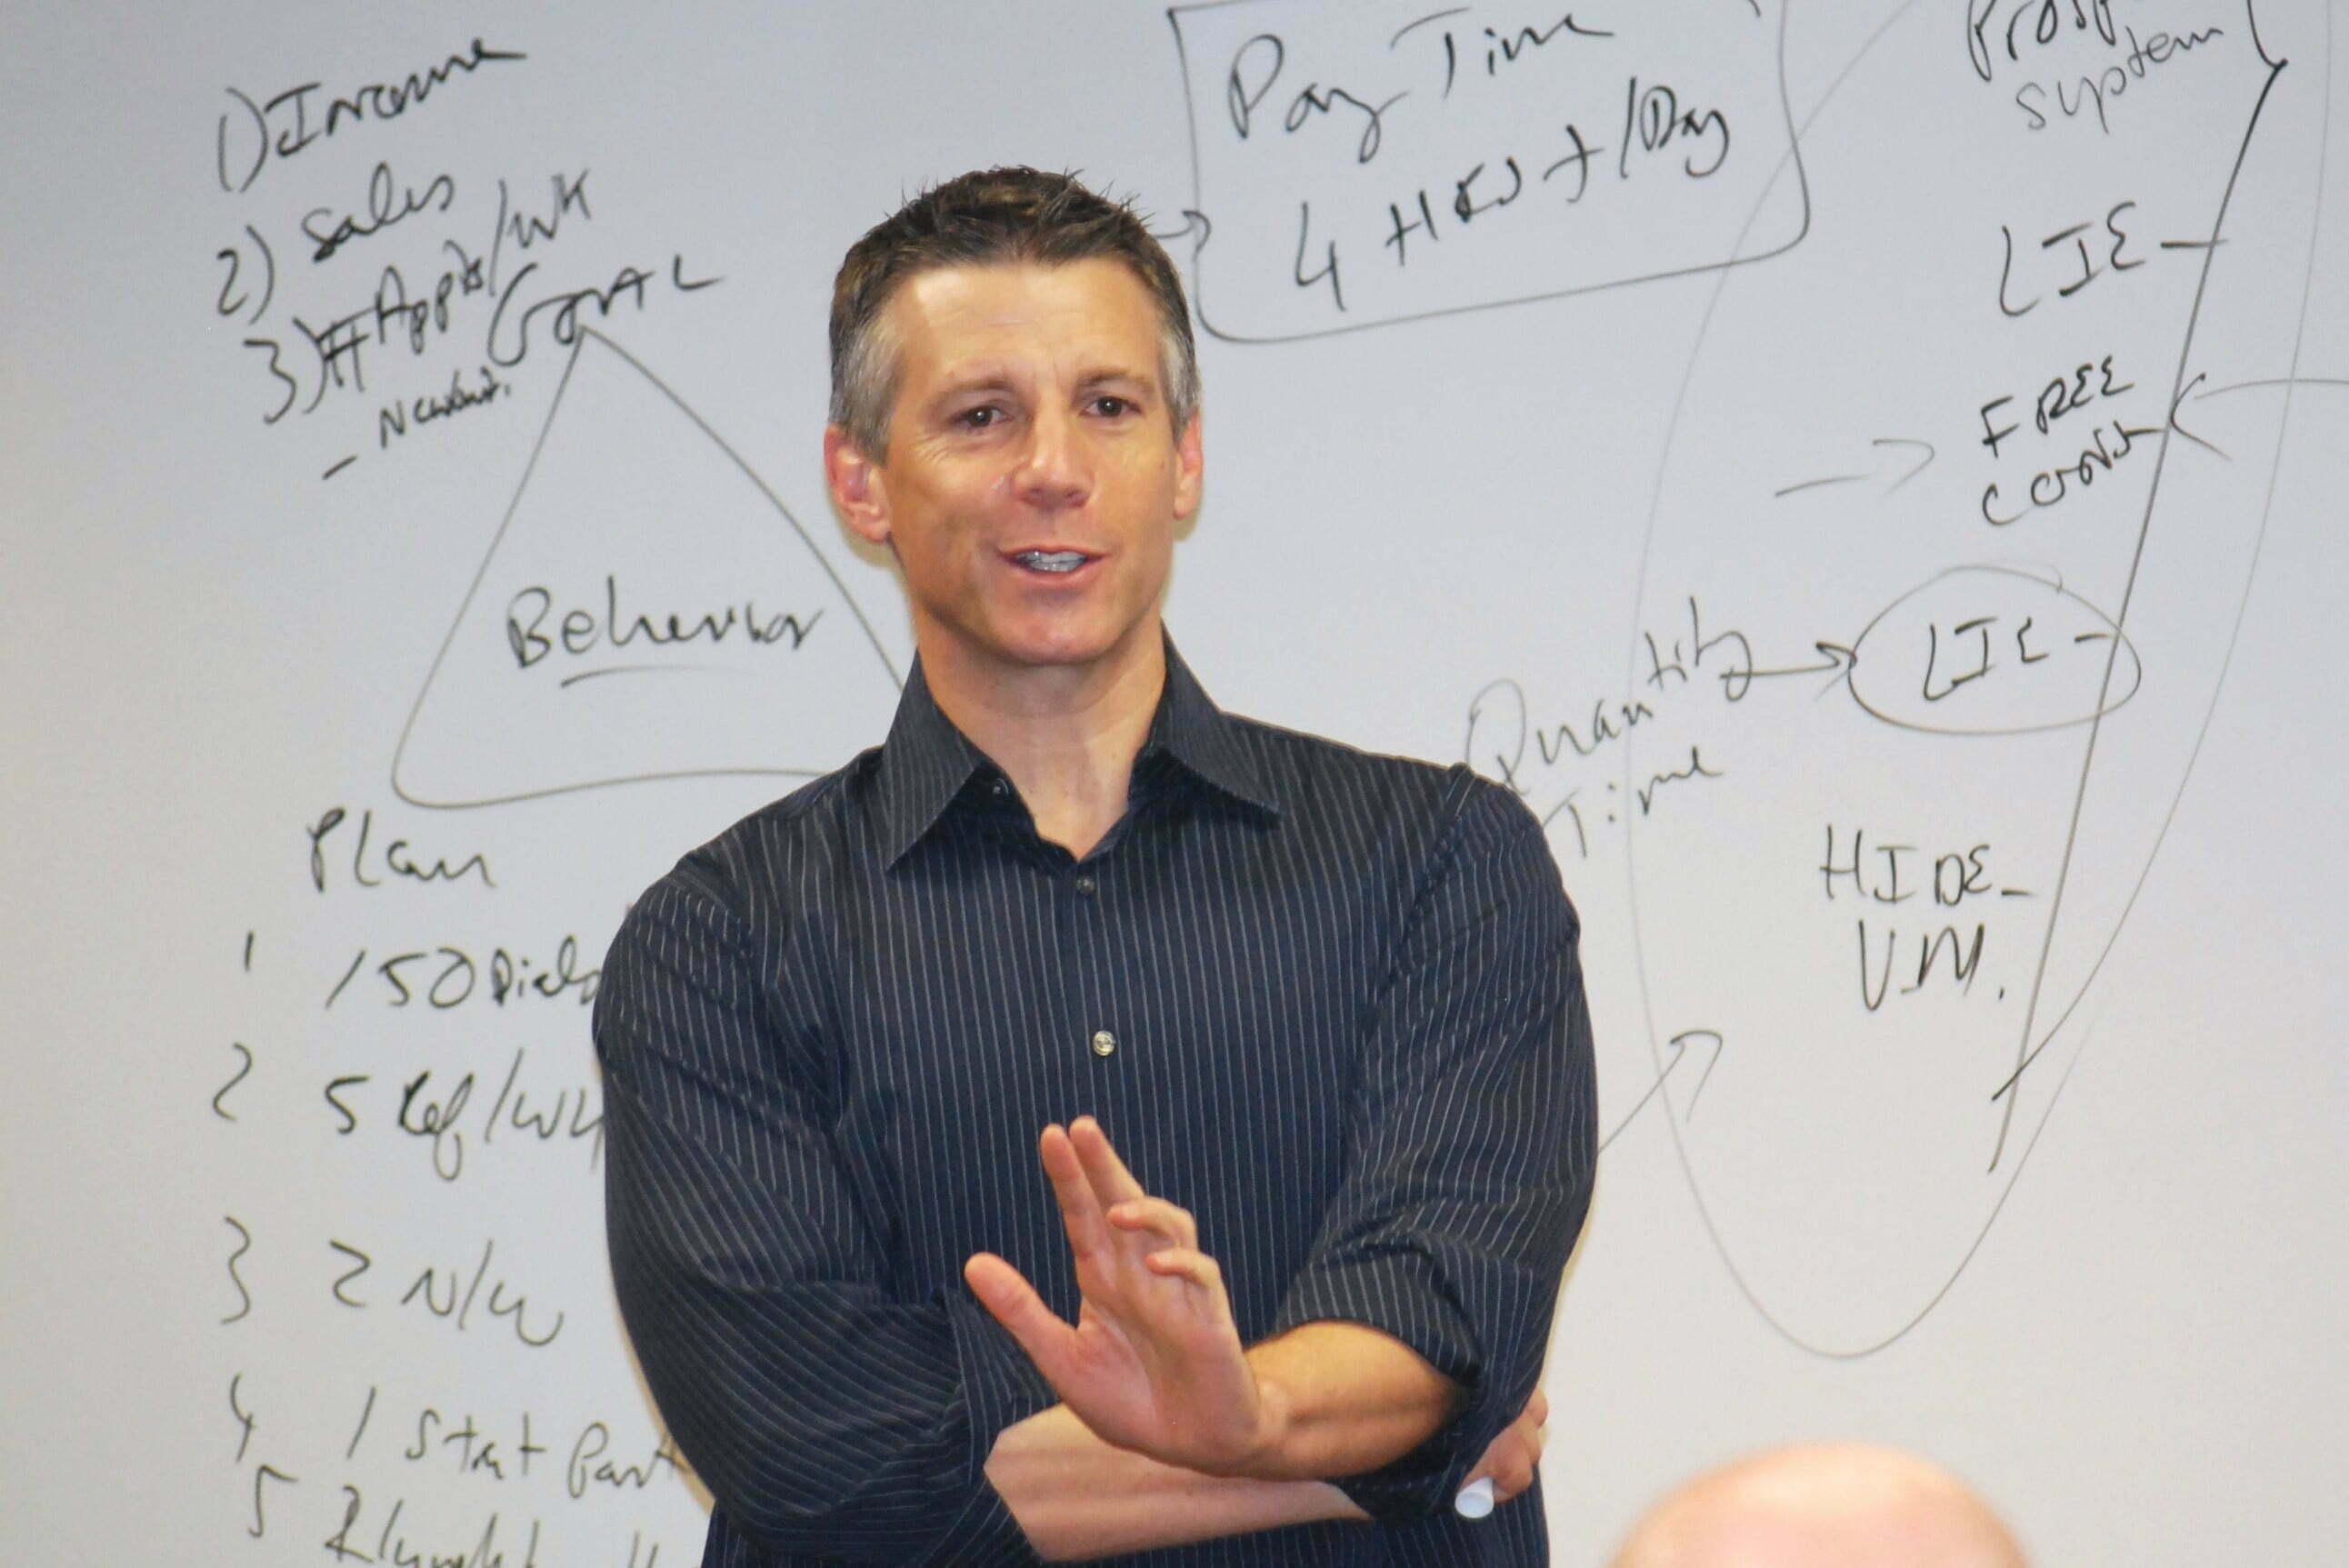 Chris Jennings teaching a class at Sandler Training